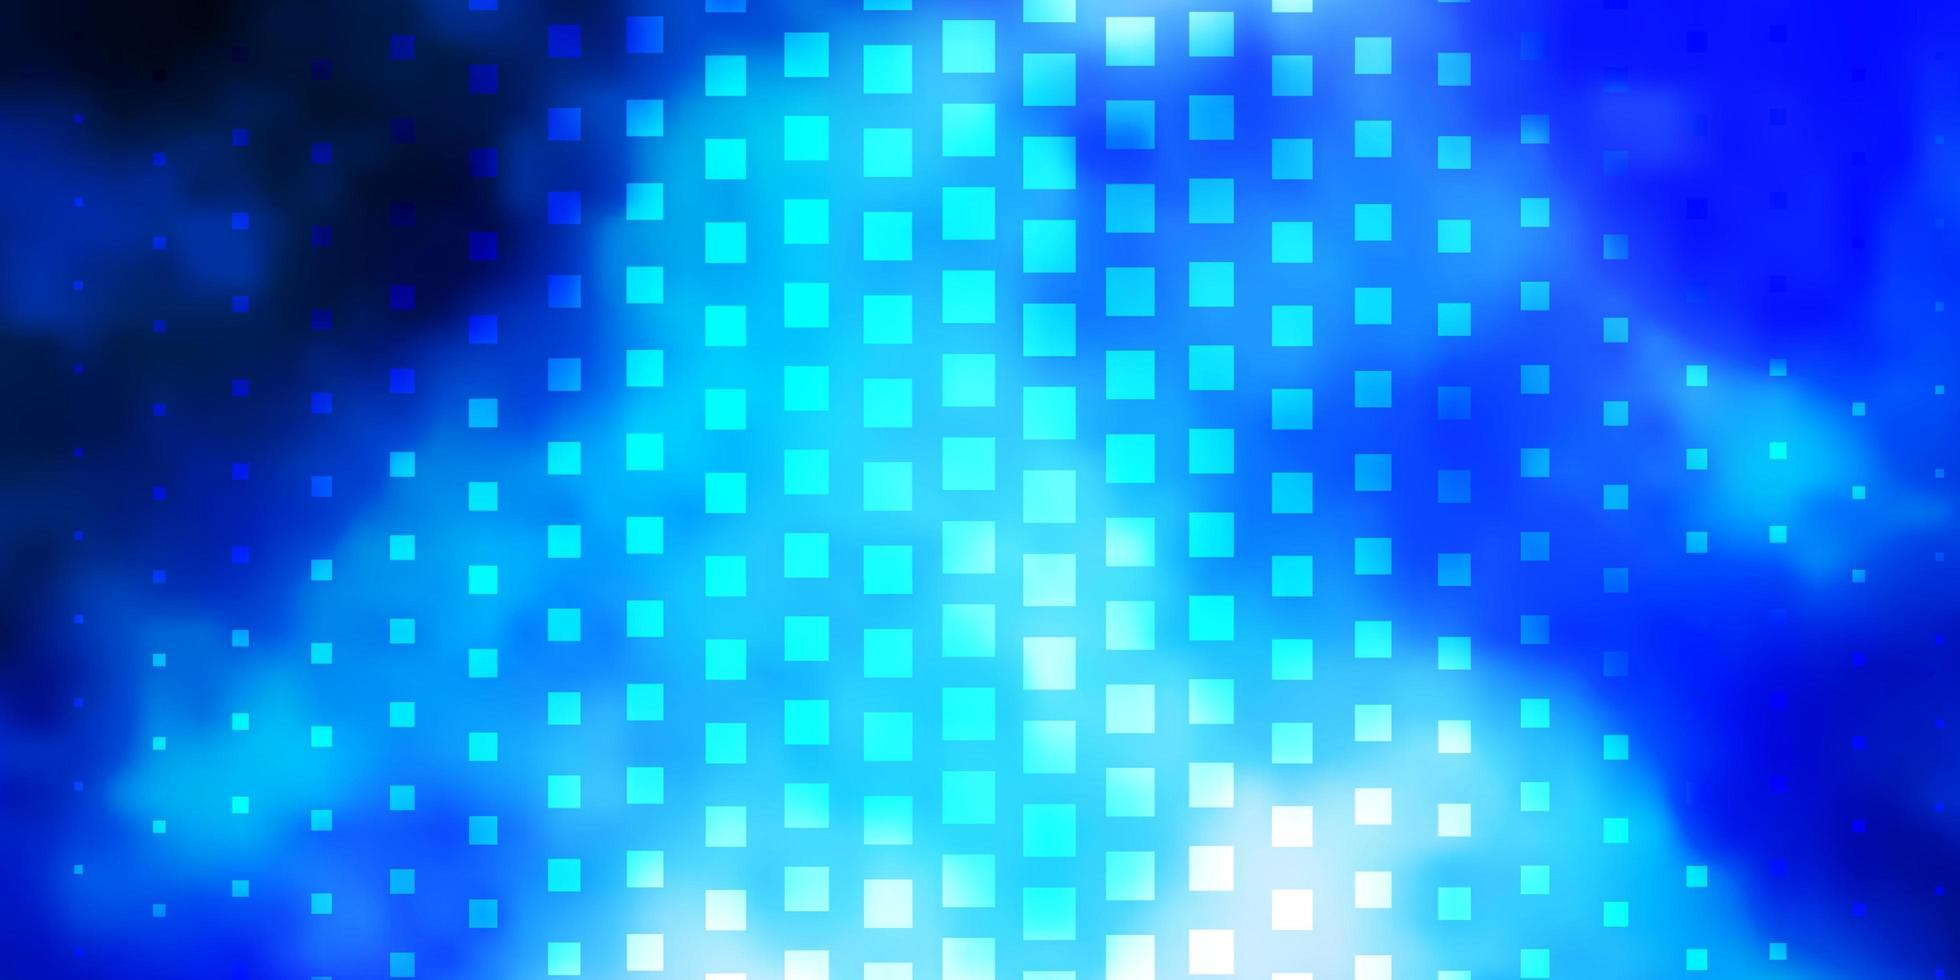 blå mall med rektanglar. vektor